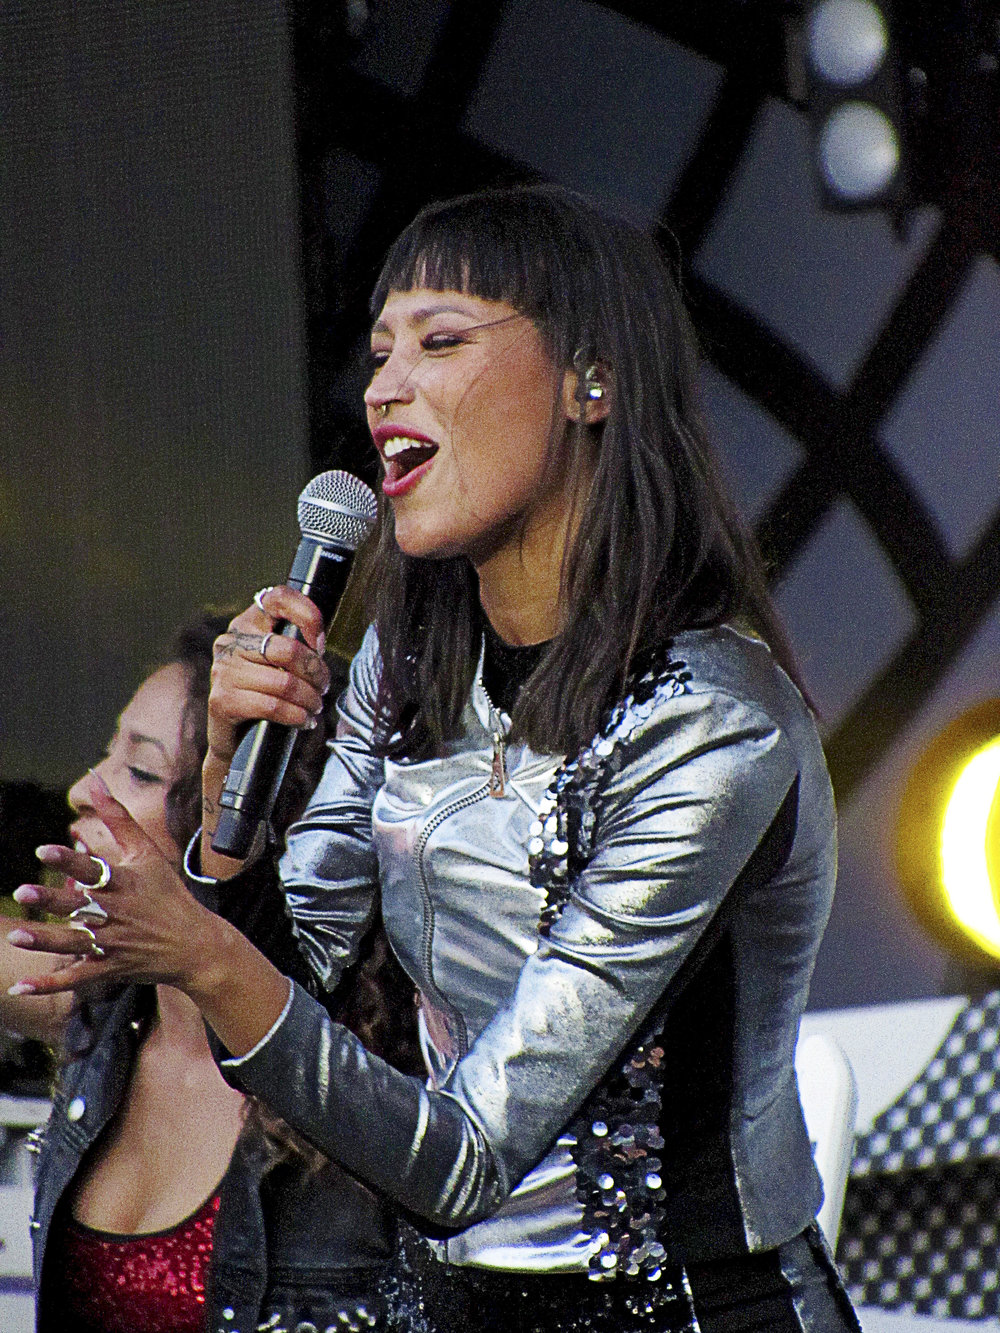 Aino Jawo of Icona Pop